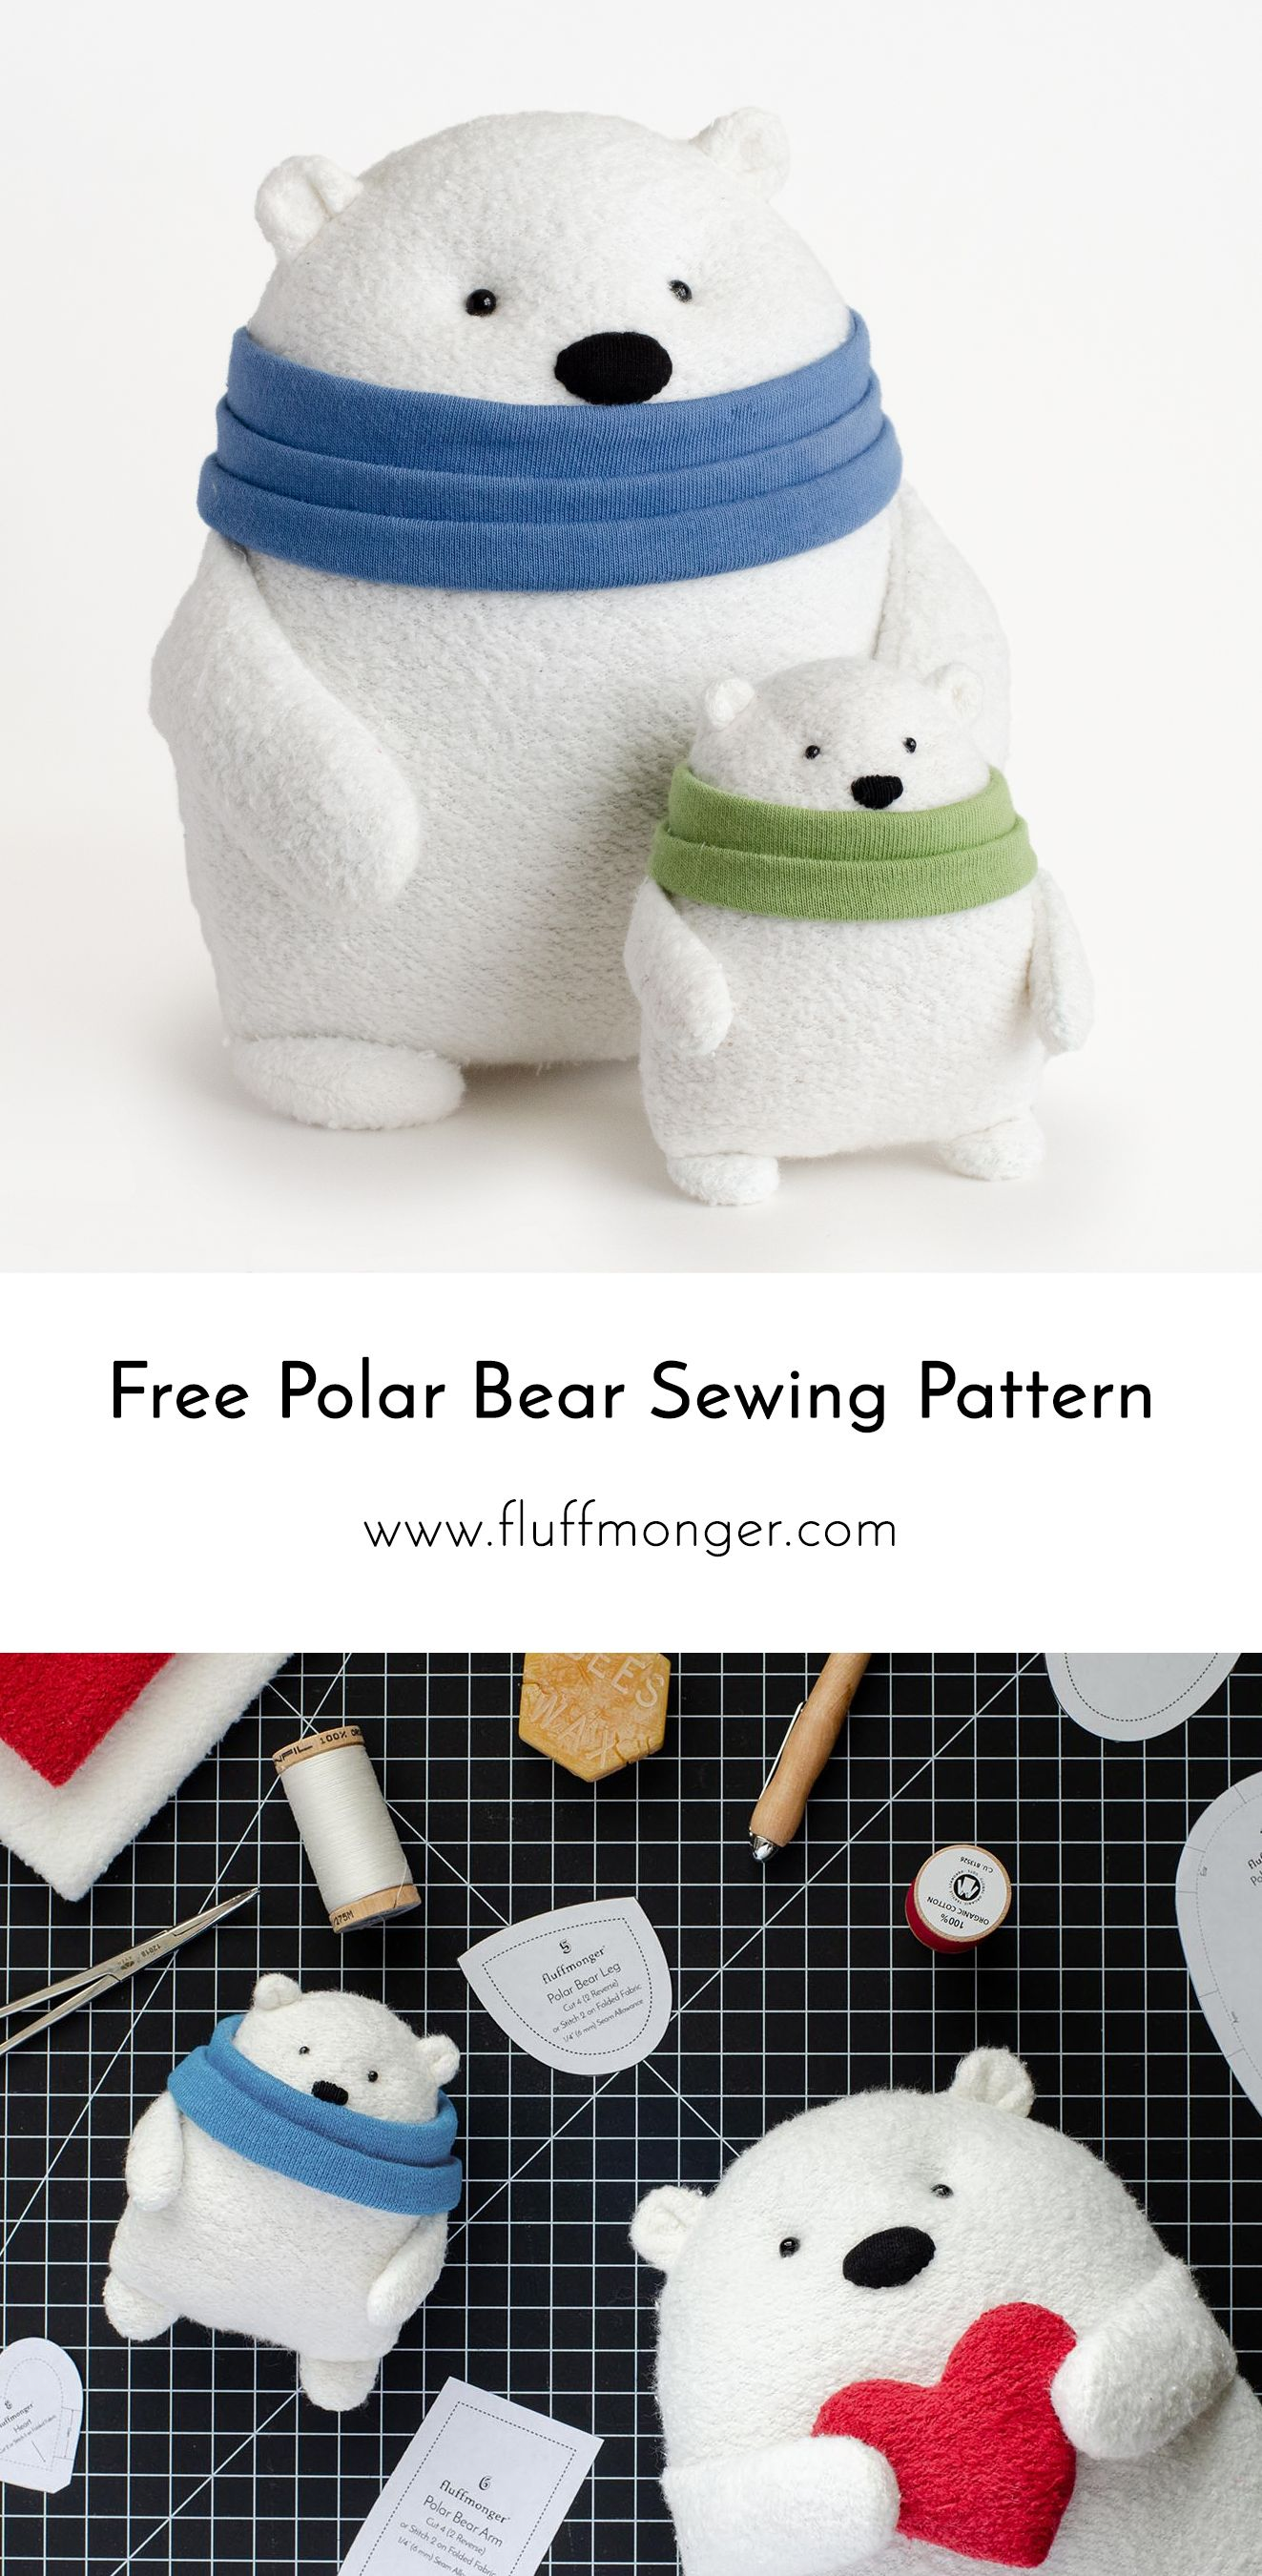 Mr. Foofs the Polar Bear Free Sewing Pattern and Tutorial | I FELT ...